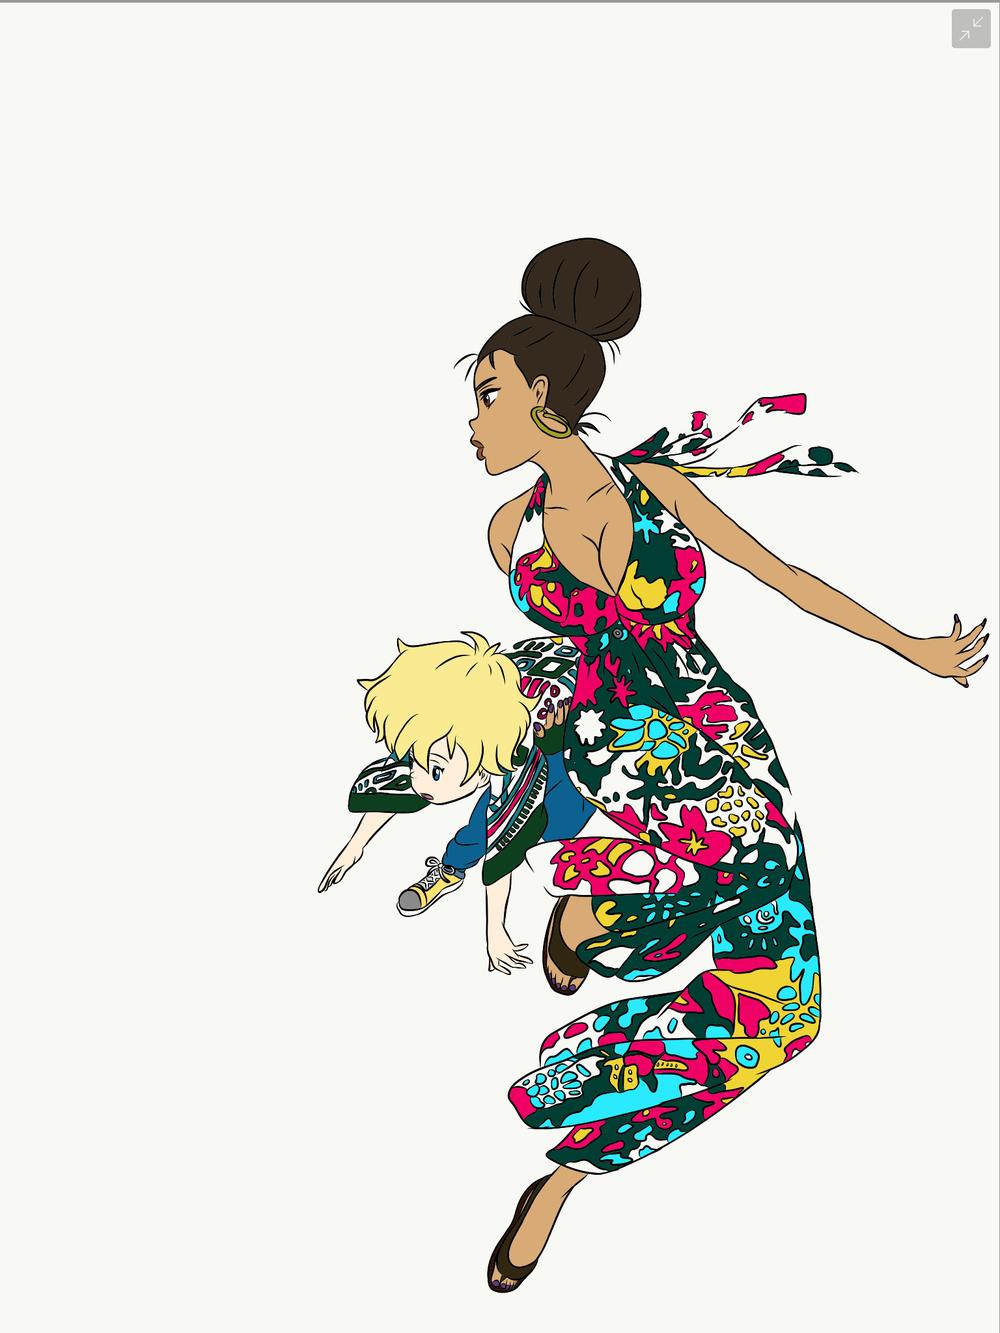 michiko-and-hatchin-pop-art-process-image-2.png